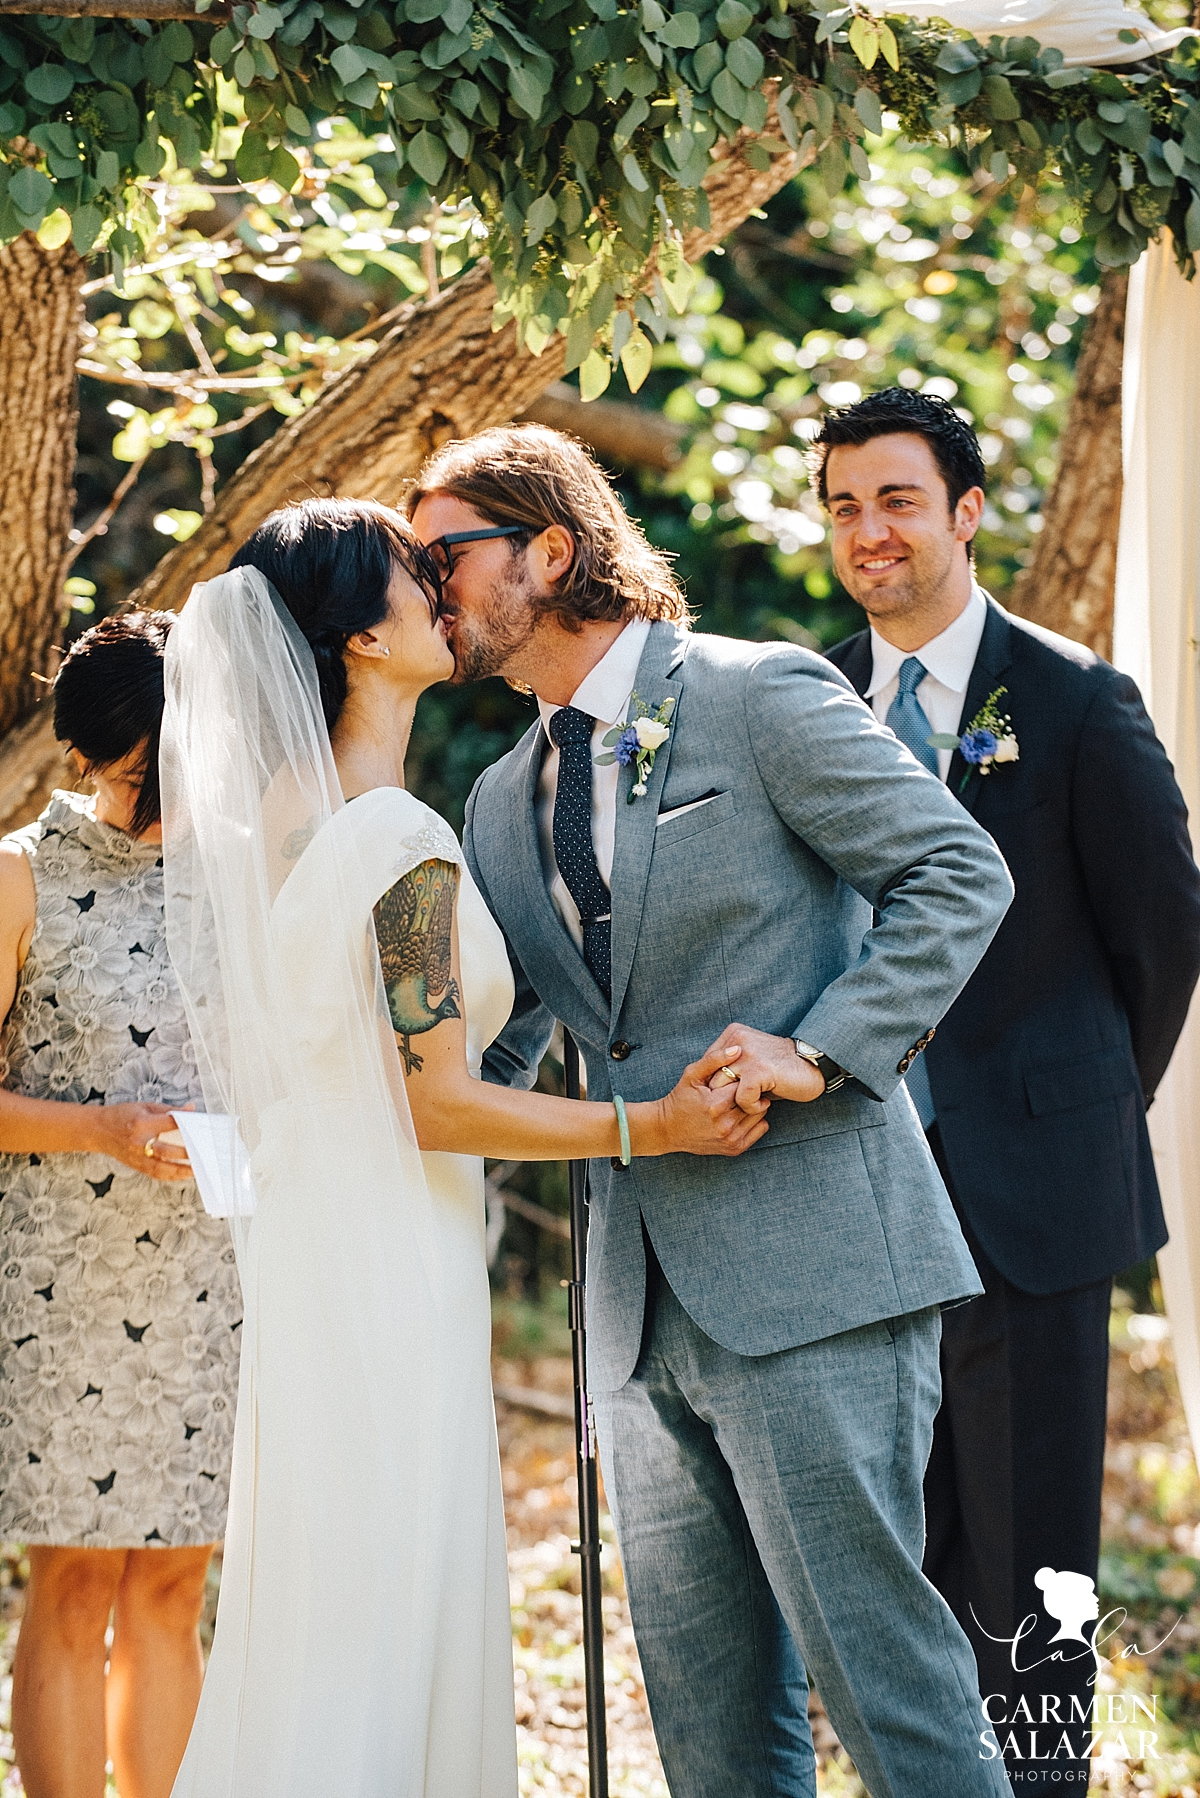 Romantic outdoor first kiss in Santa Cruz - Carmen Salazar